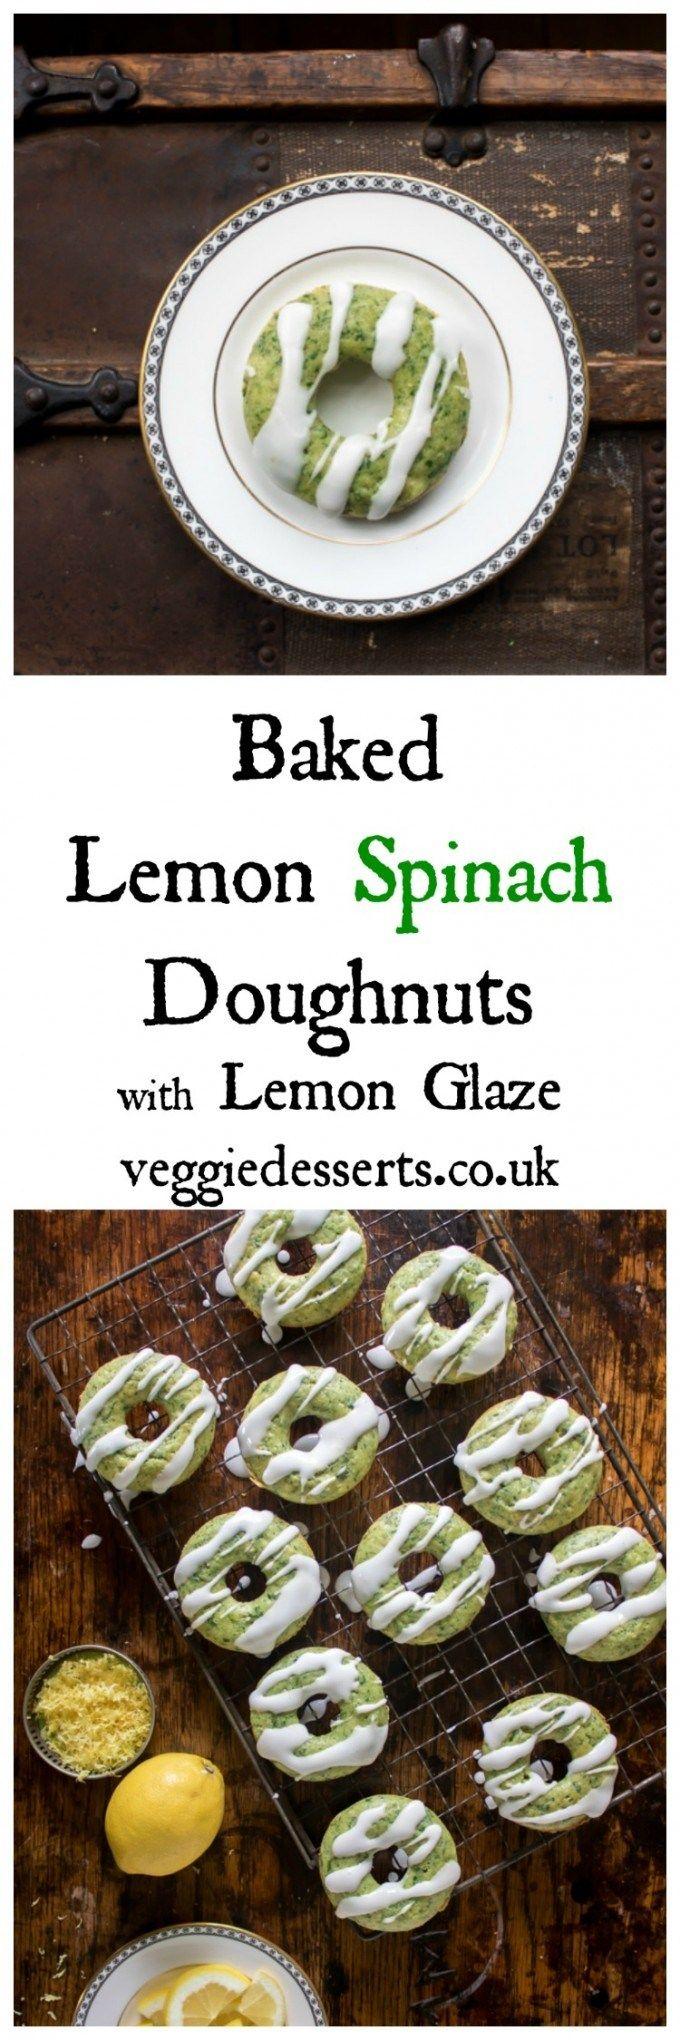 Baked Lemon Spinach Doughnuts with Lemon Glaze   Veggie Desserts Blog